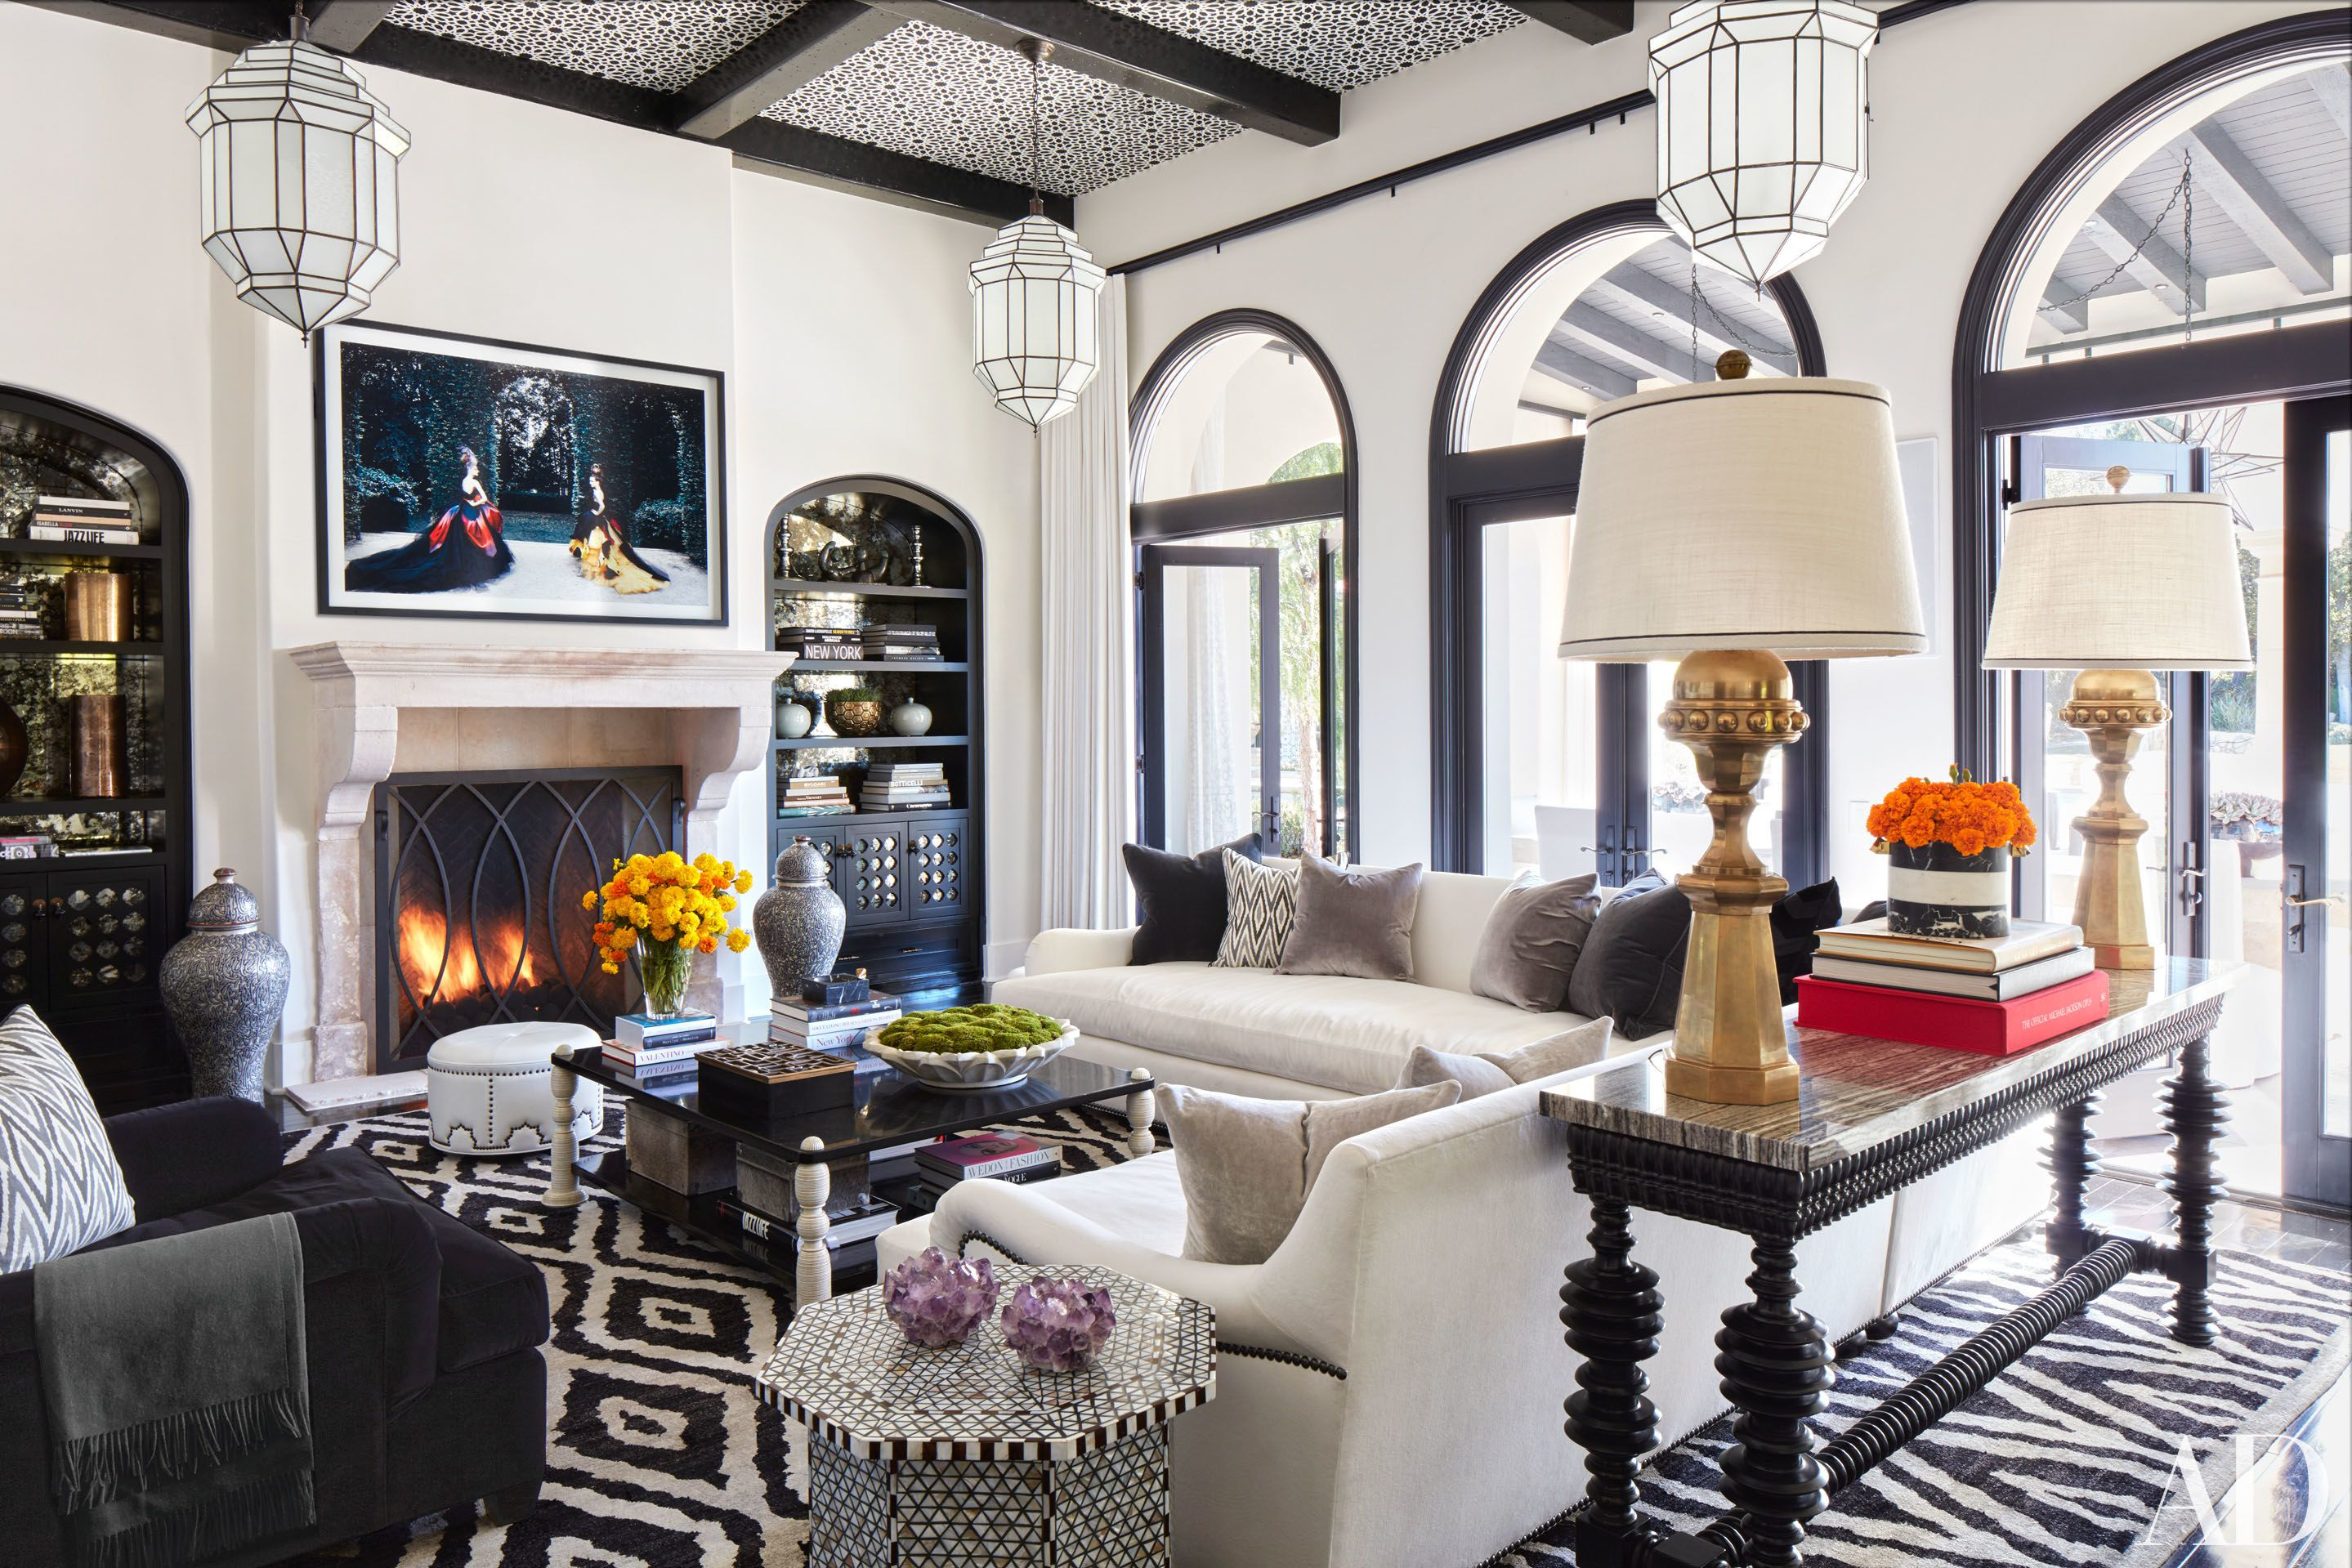 10 design ideas we love from kourtney and khlo kardashian s calabasas homes kourtney - Kardashian home design ...